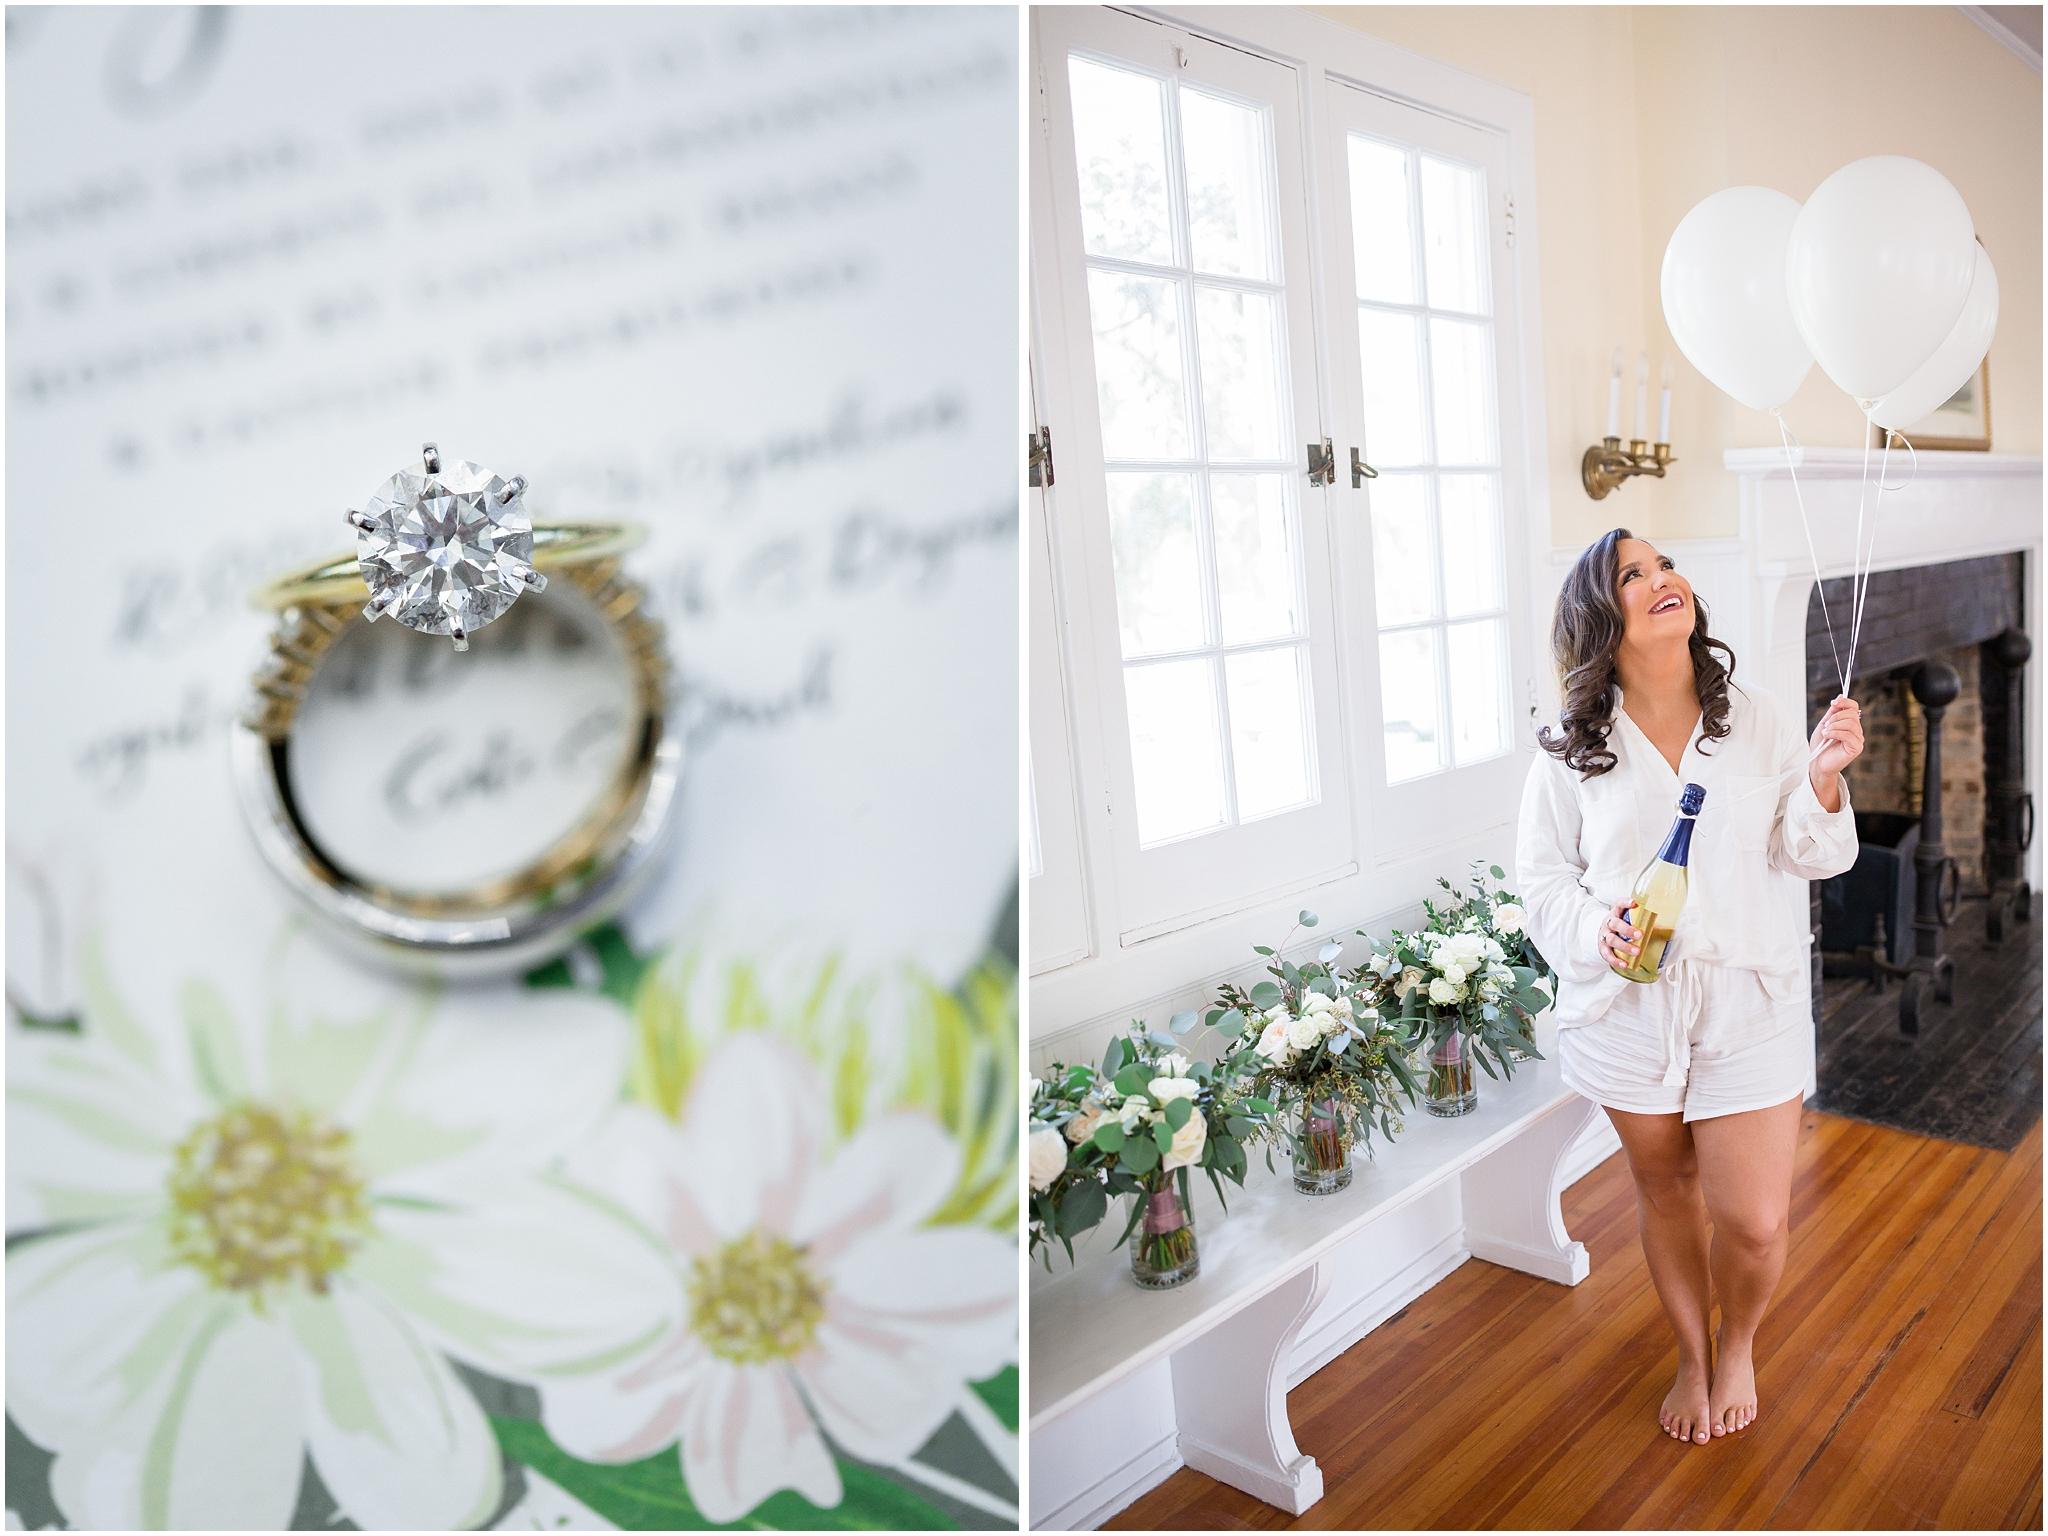 Tallahassee_wedding.jpg